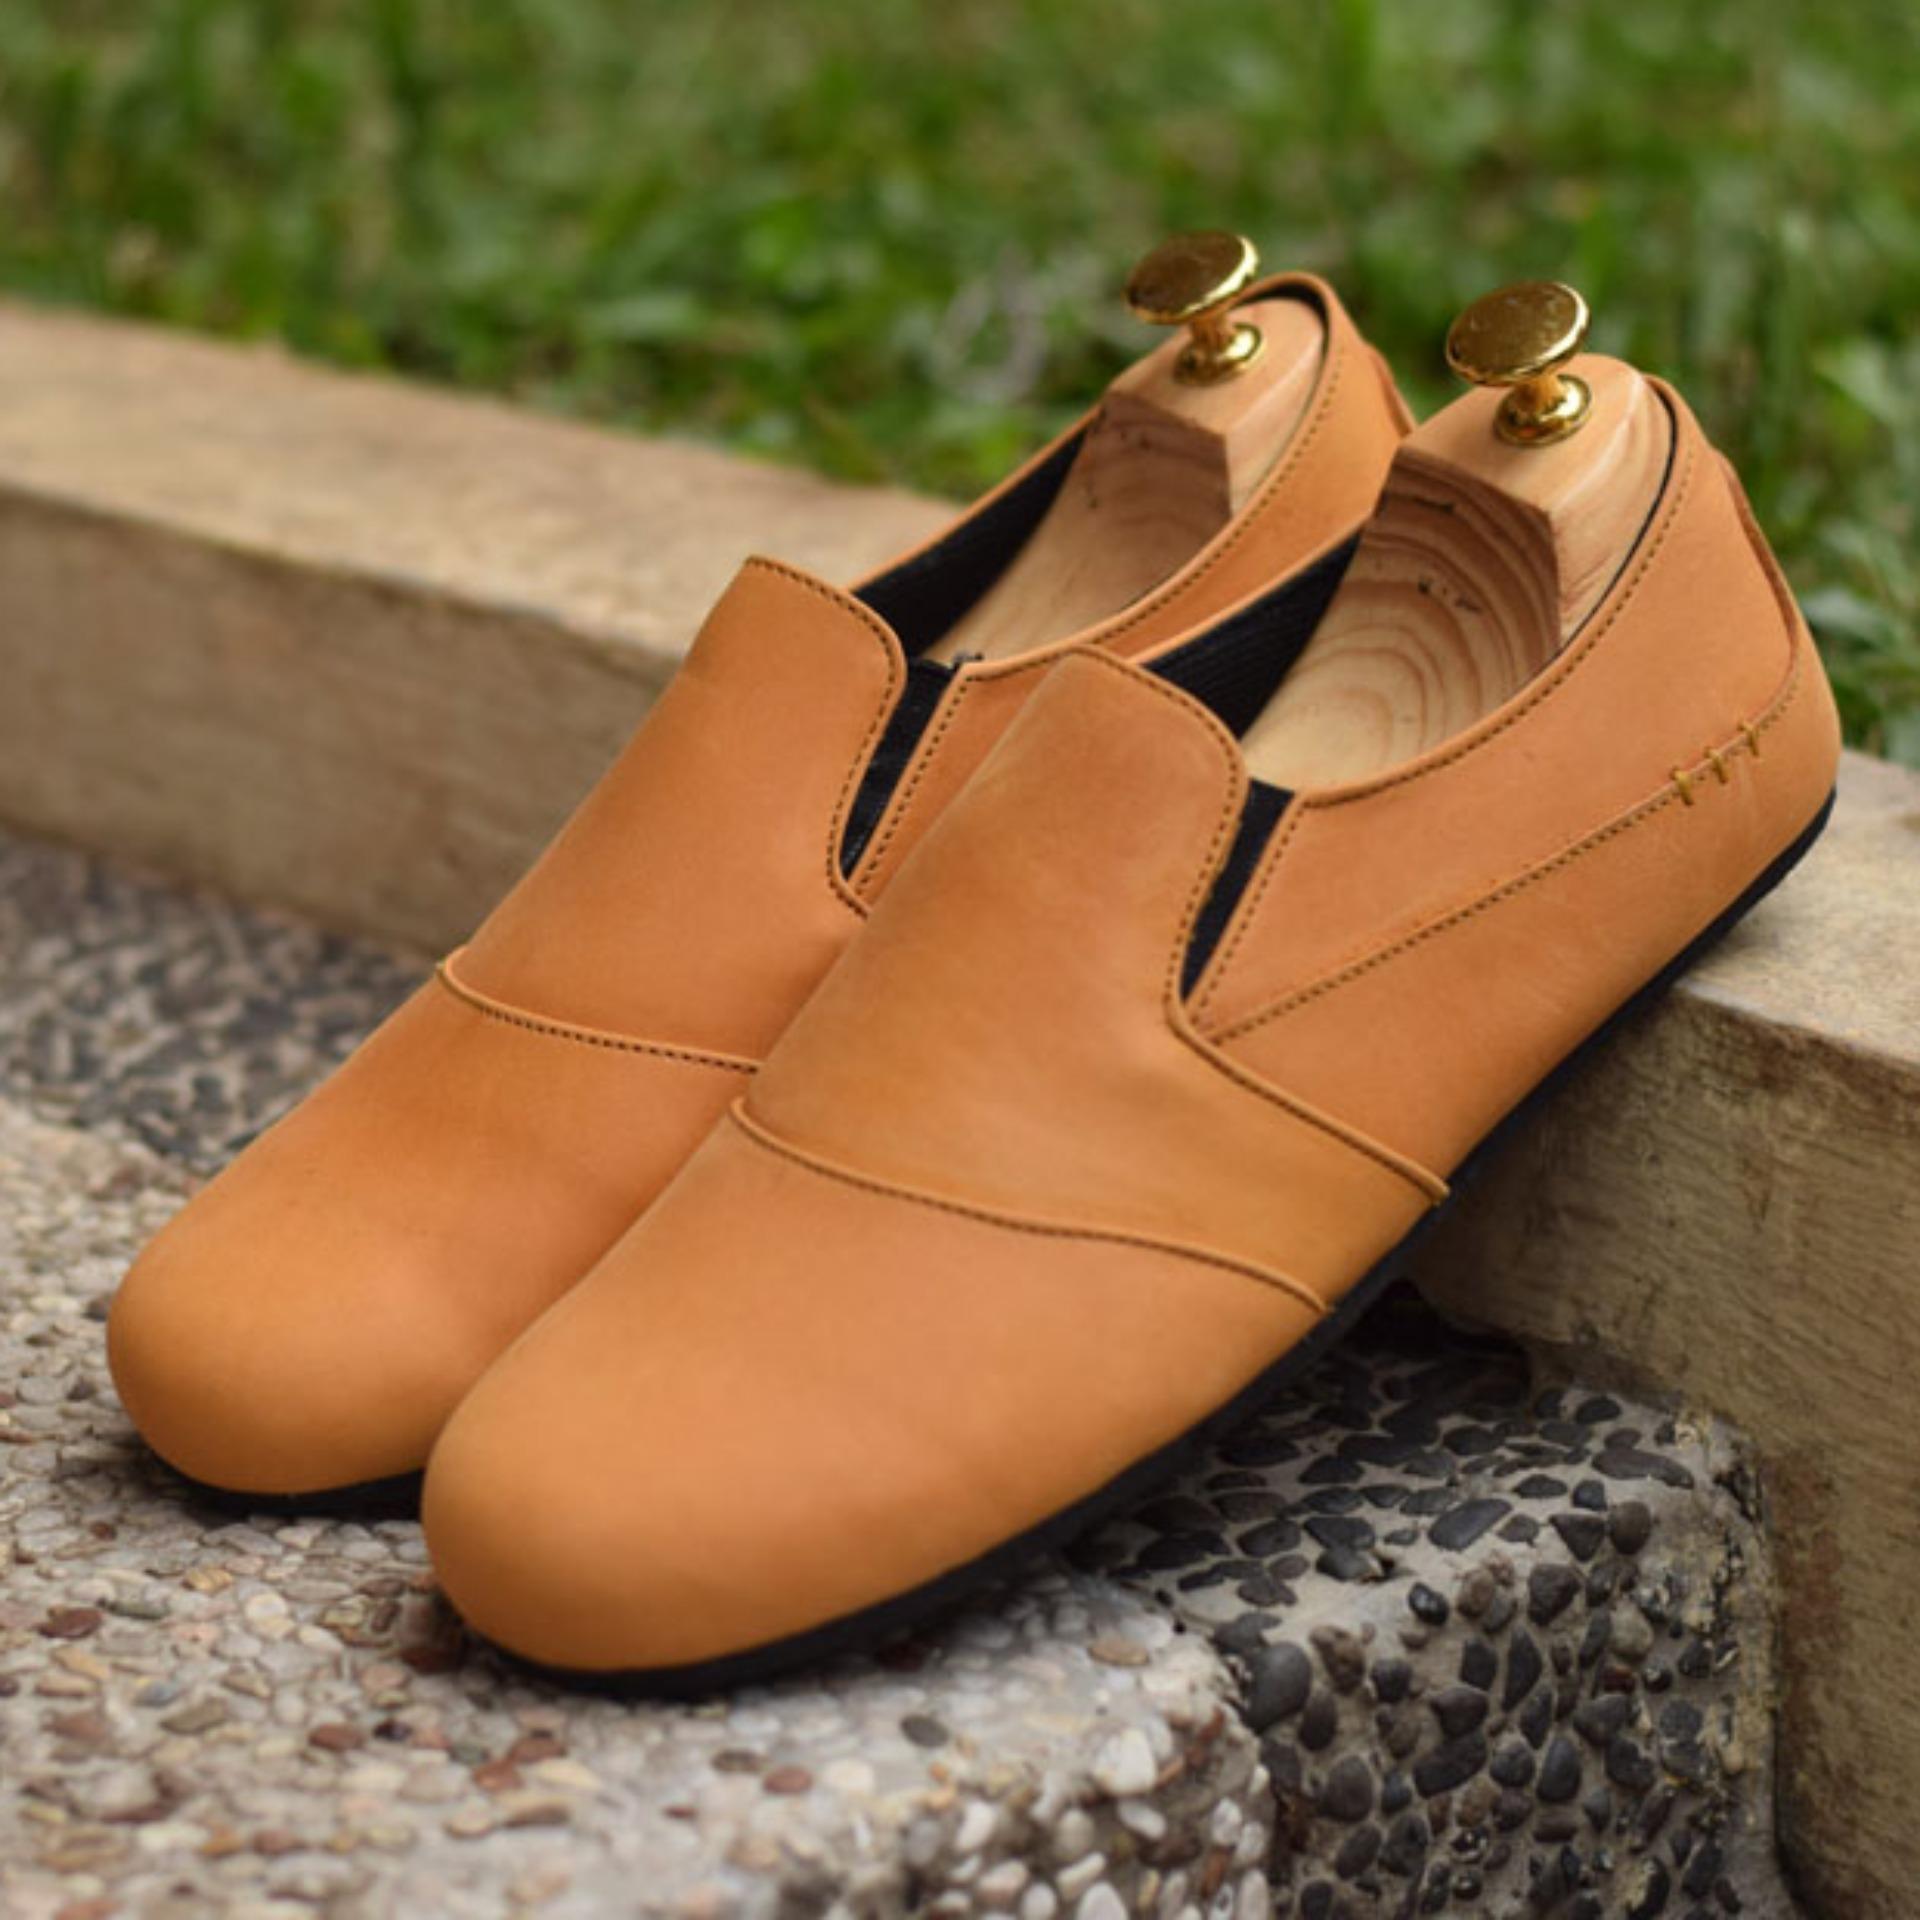 Beli Sepatu Slip On Pria Azcost Monroe Kulit Asli Tan Online